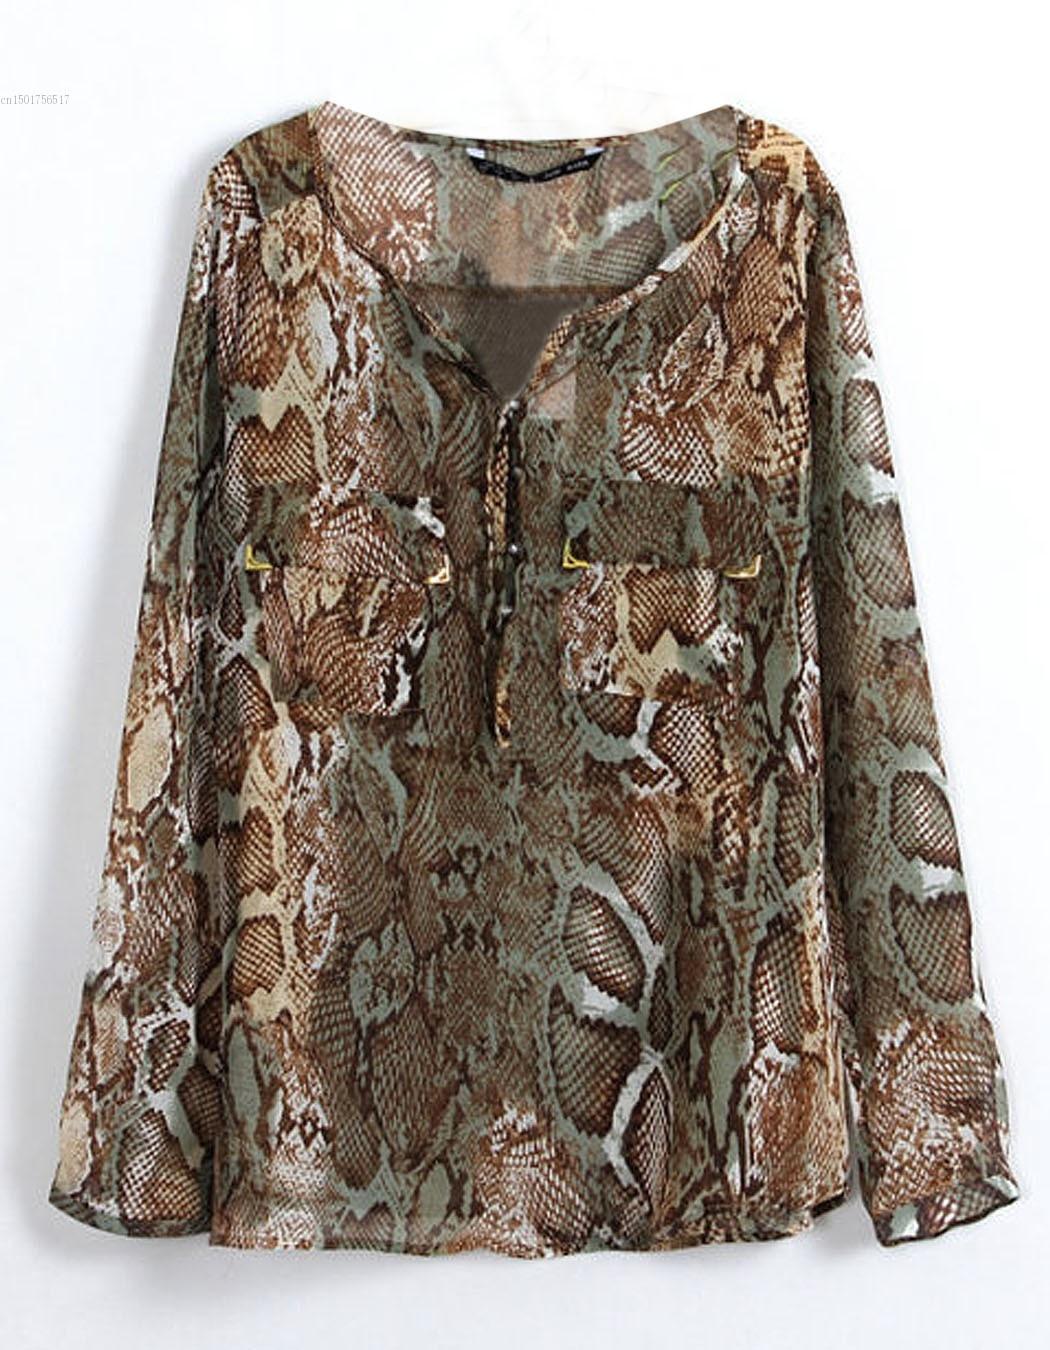 2014 Fashion Mother's See-through Sheer Tops Shirt Leopard Printed Chiffon Shirts Women Sexy Long-sleeve Blouses SV14